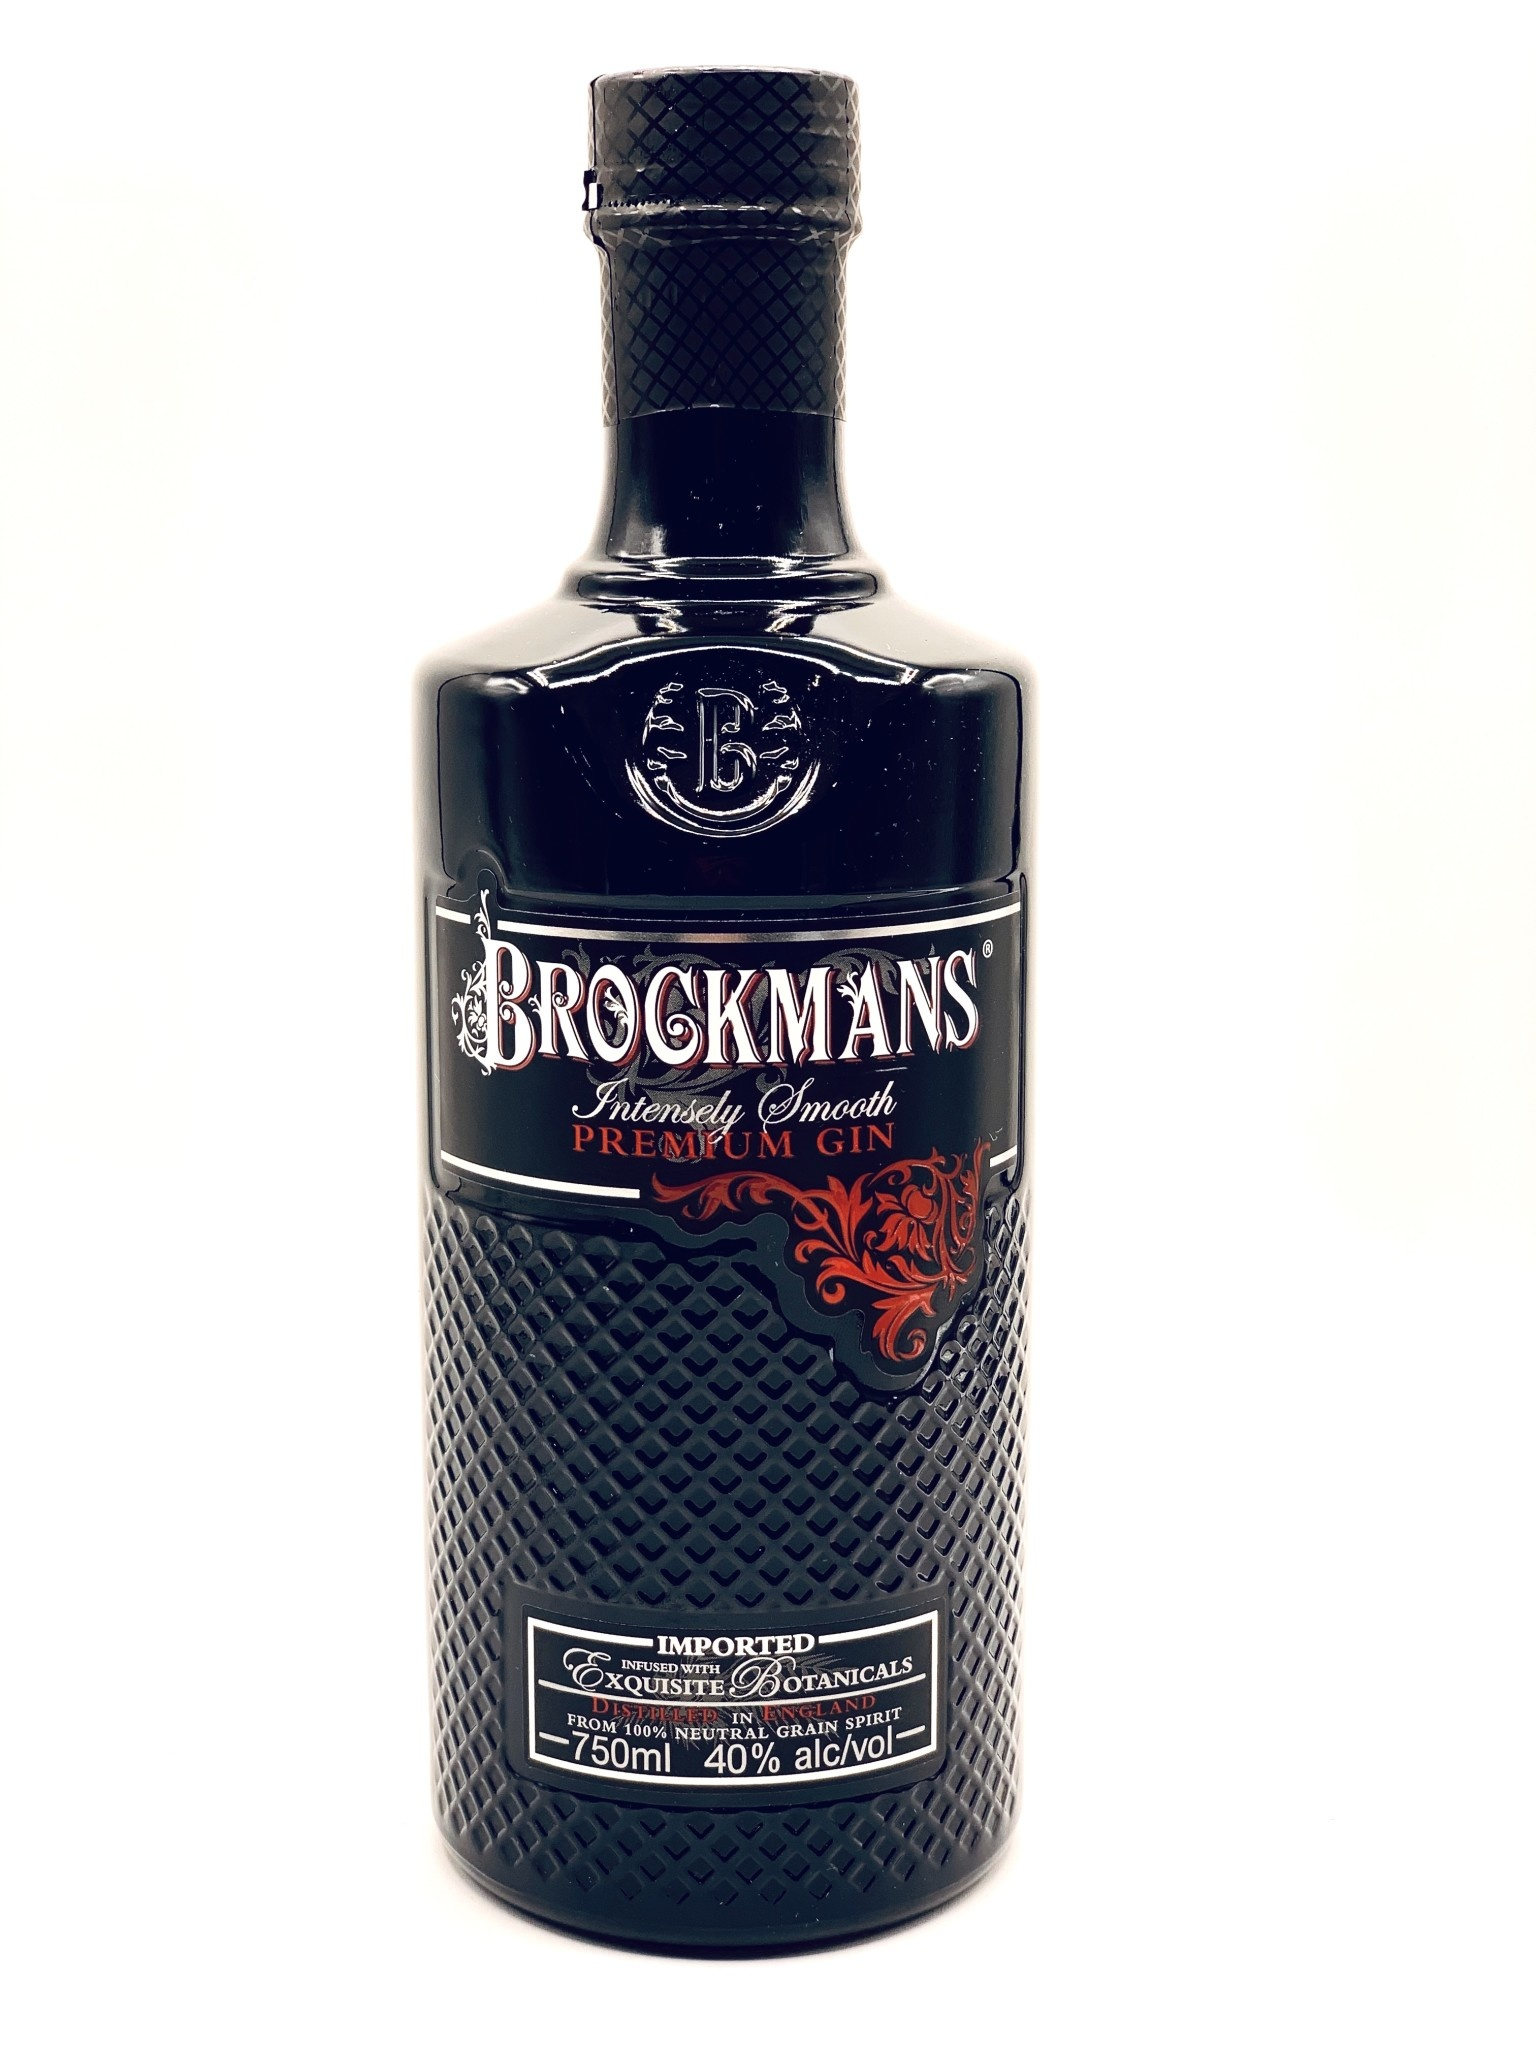 Brockmans Premium English Gin (80 proof)  750ml